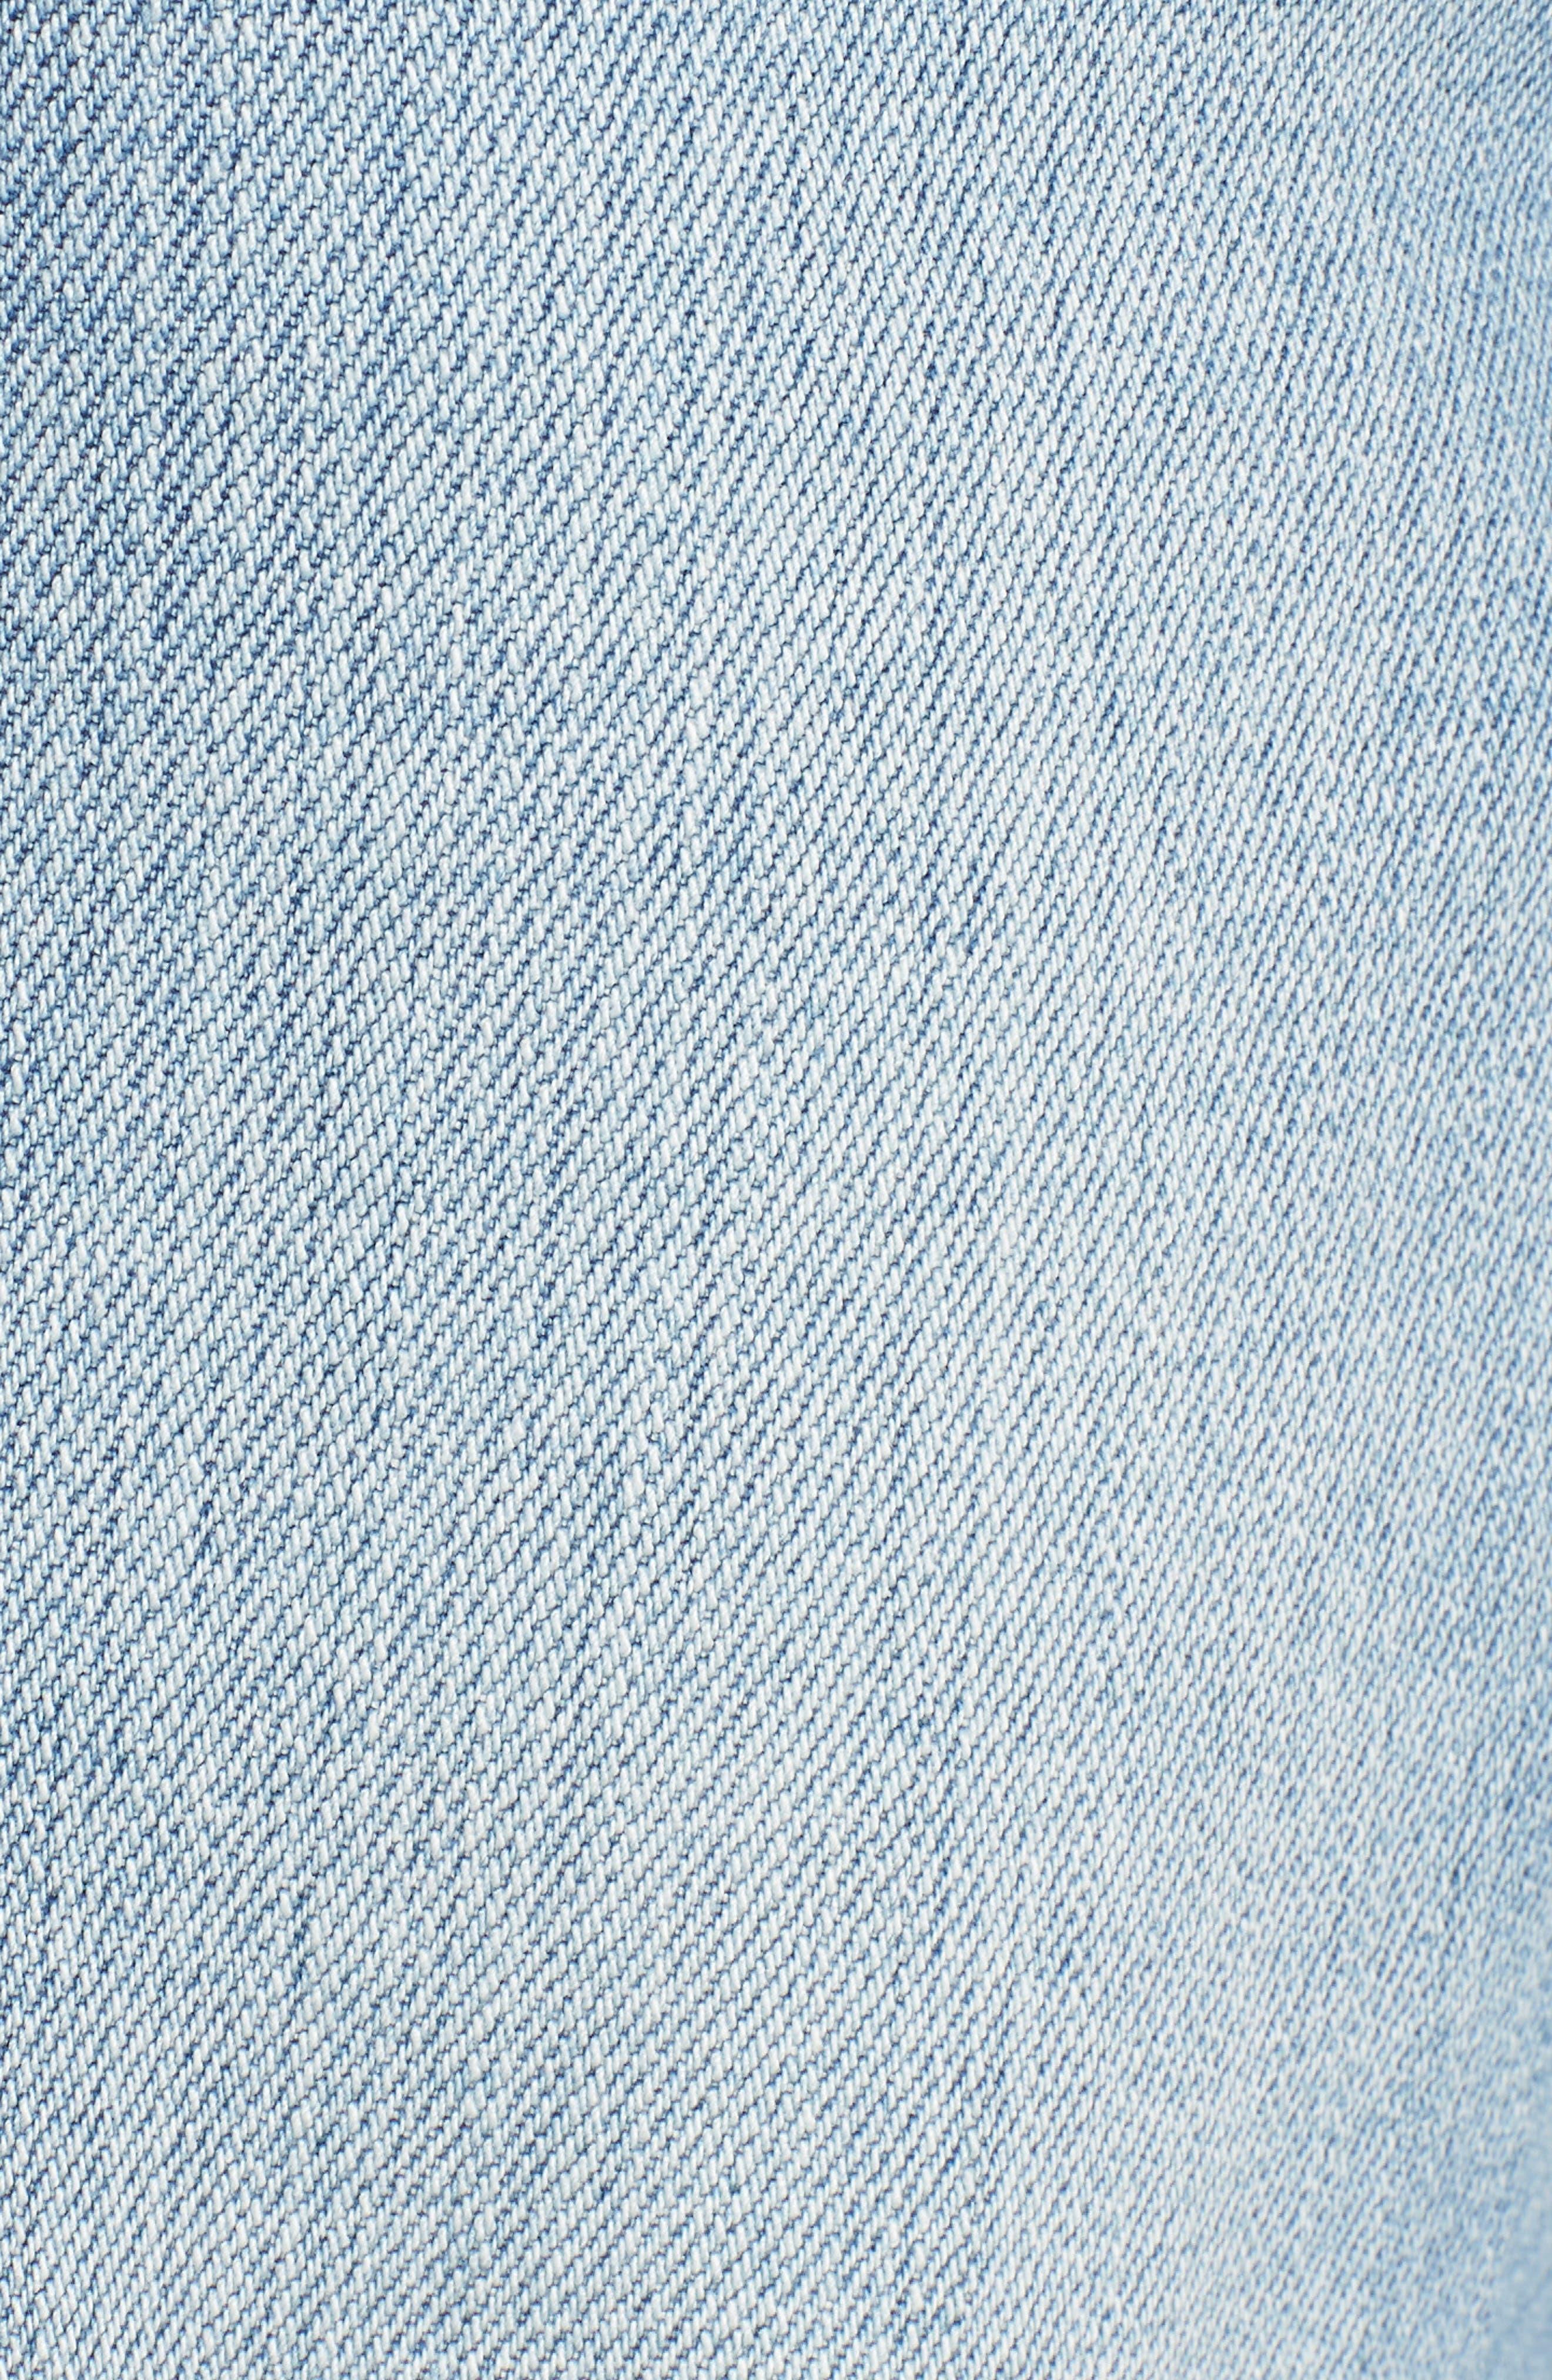 Wylie High Rise Distressed Bermuda Denim Shorts,                             Alternate thumbnail 6, color,                             Varnish